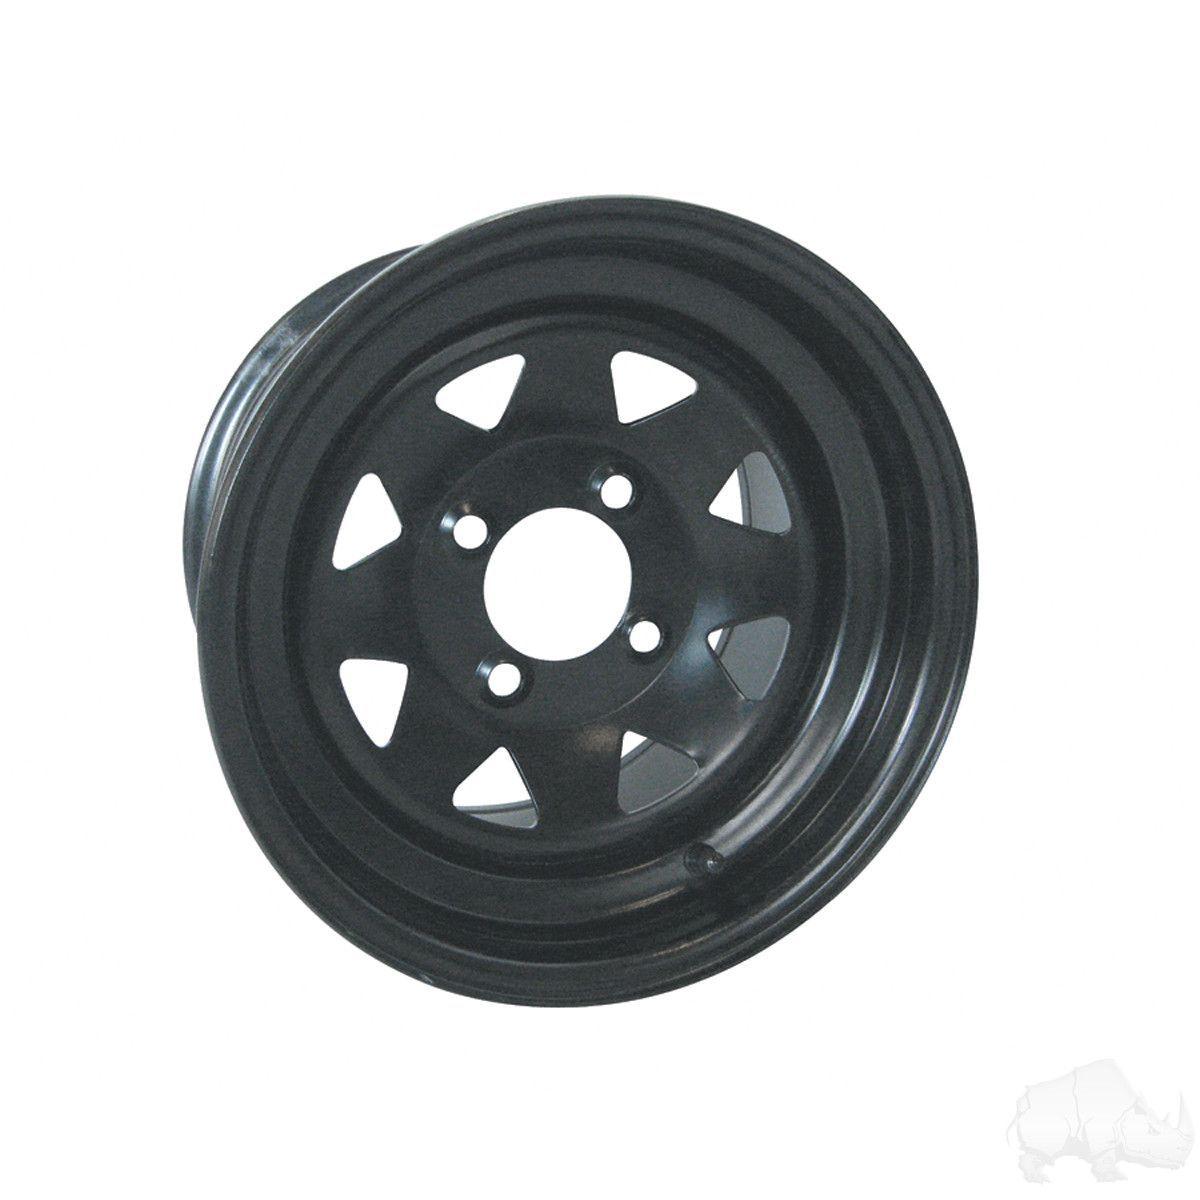 Steel Black 12x7.5